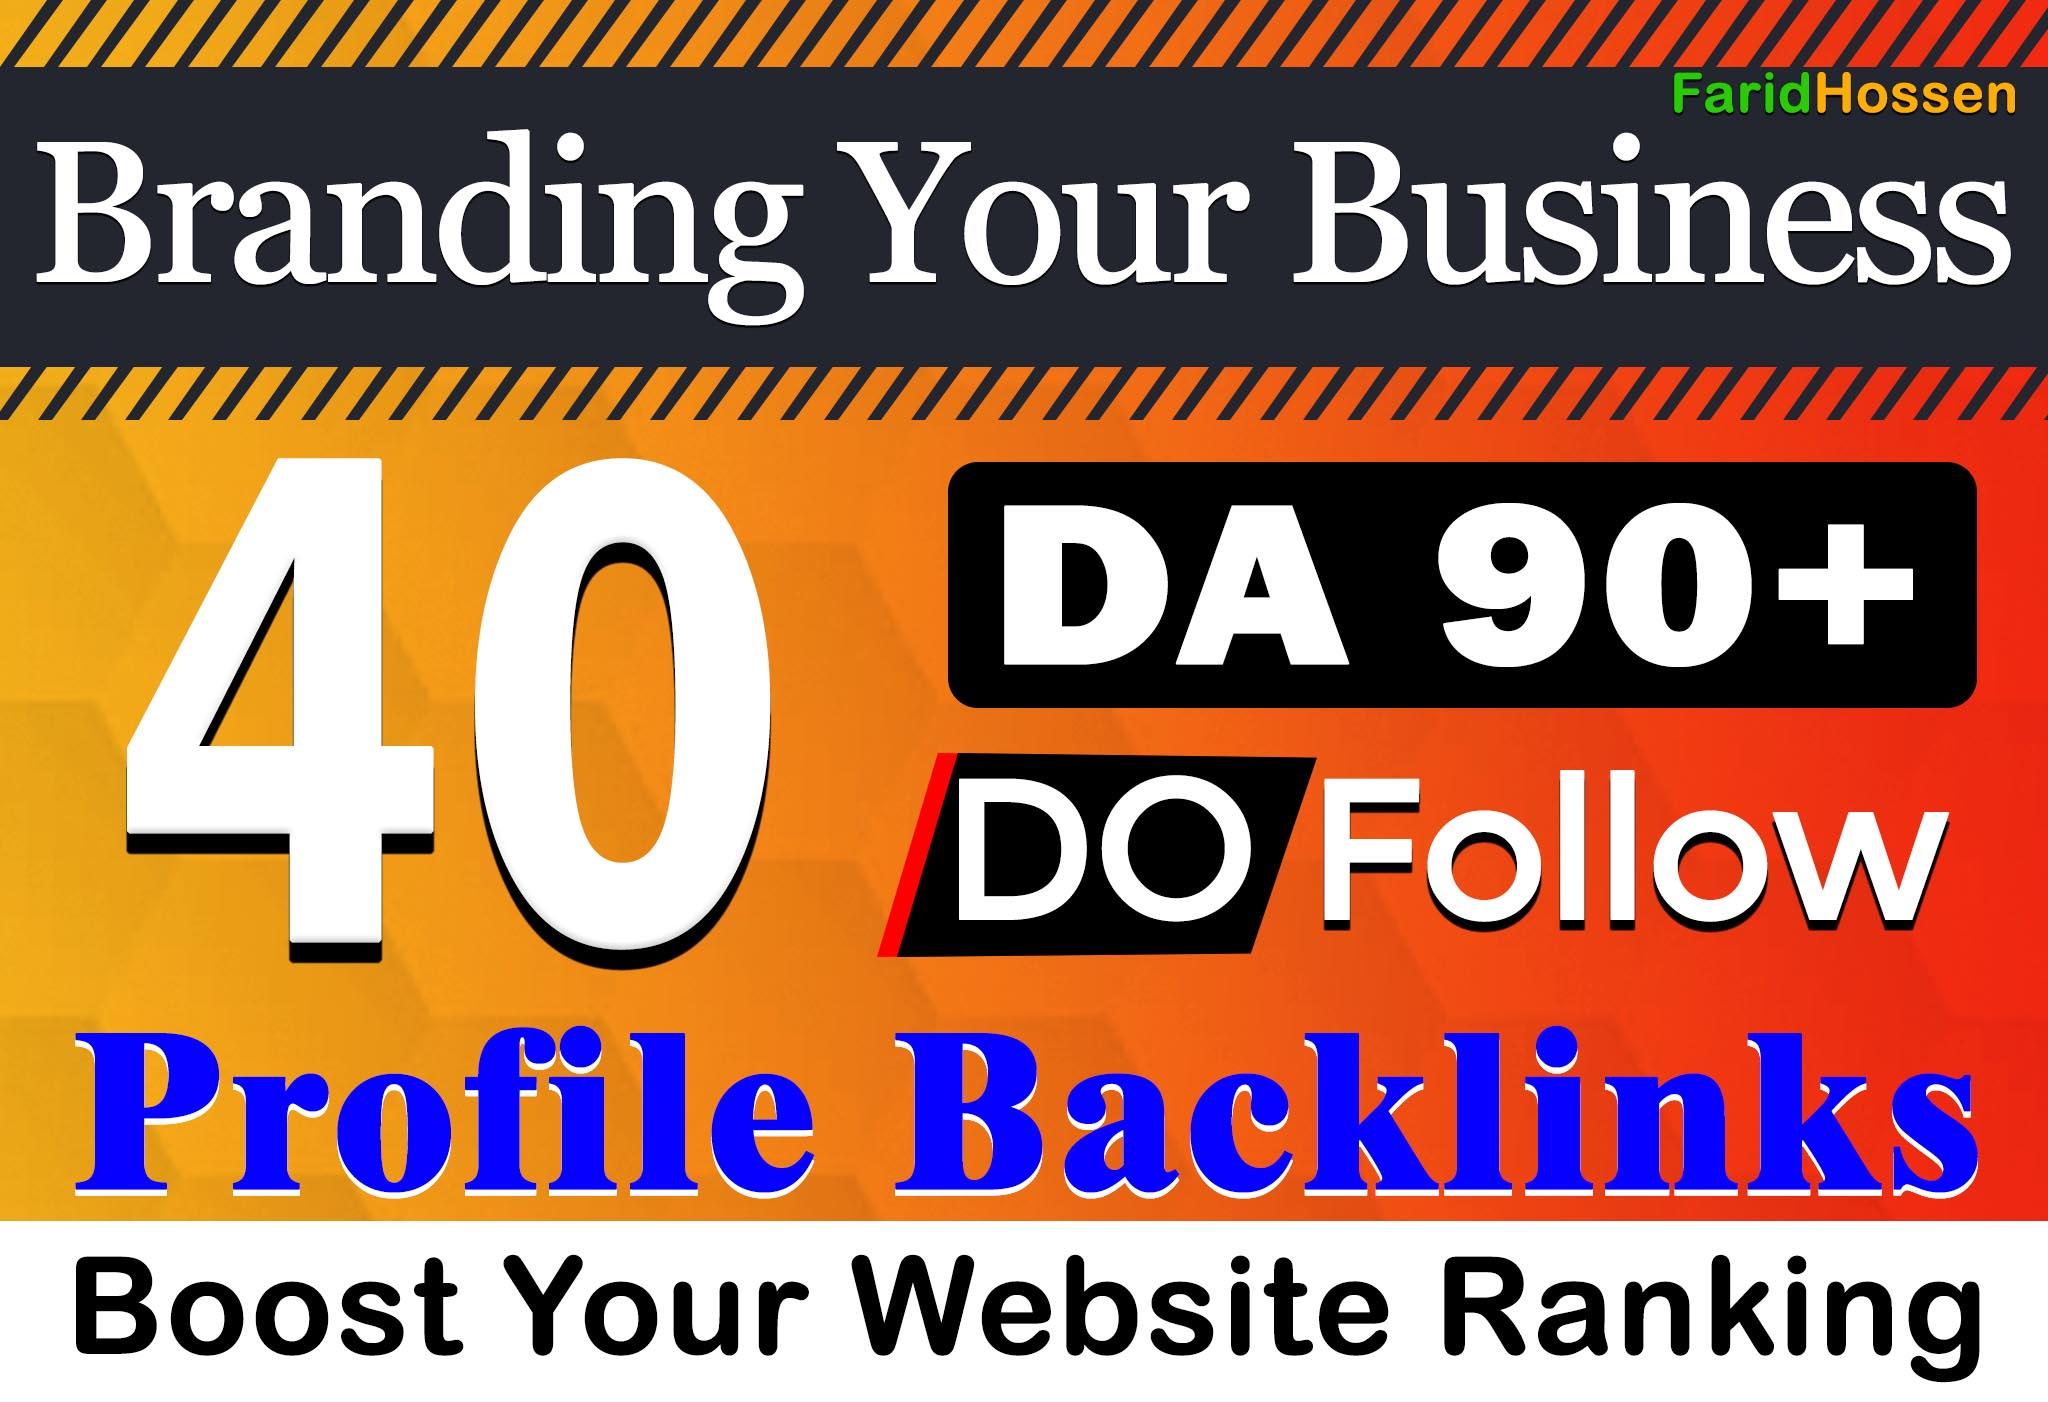 Manual DA 90+ Unique Domain 40 Do-Follow Profile Backlinks